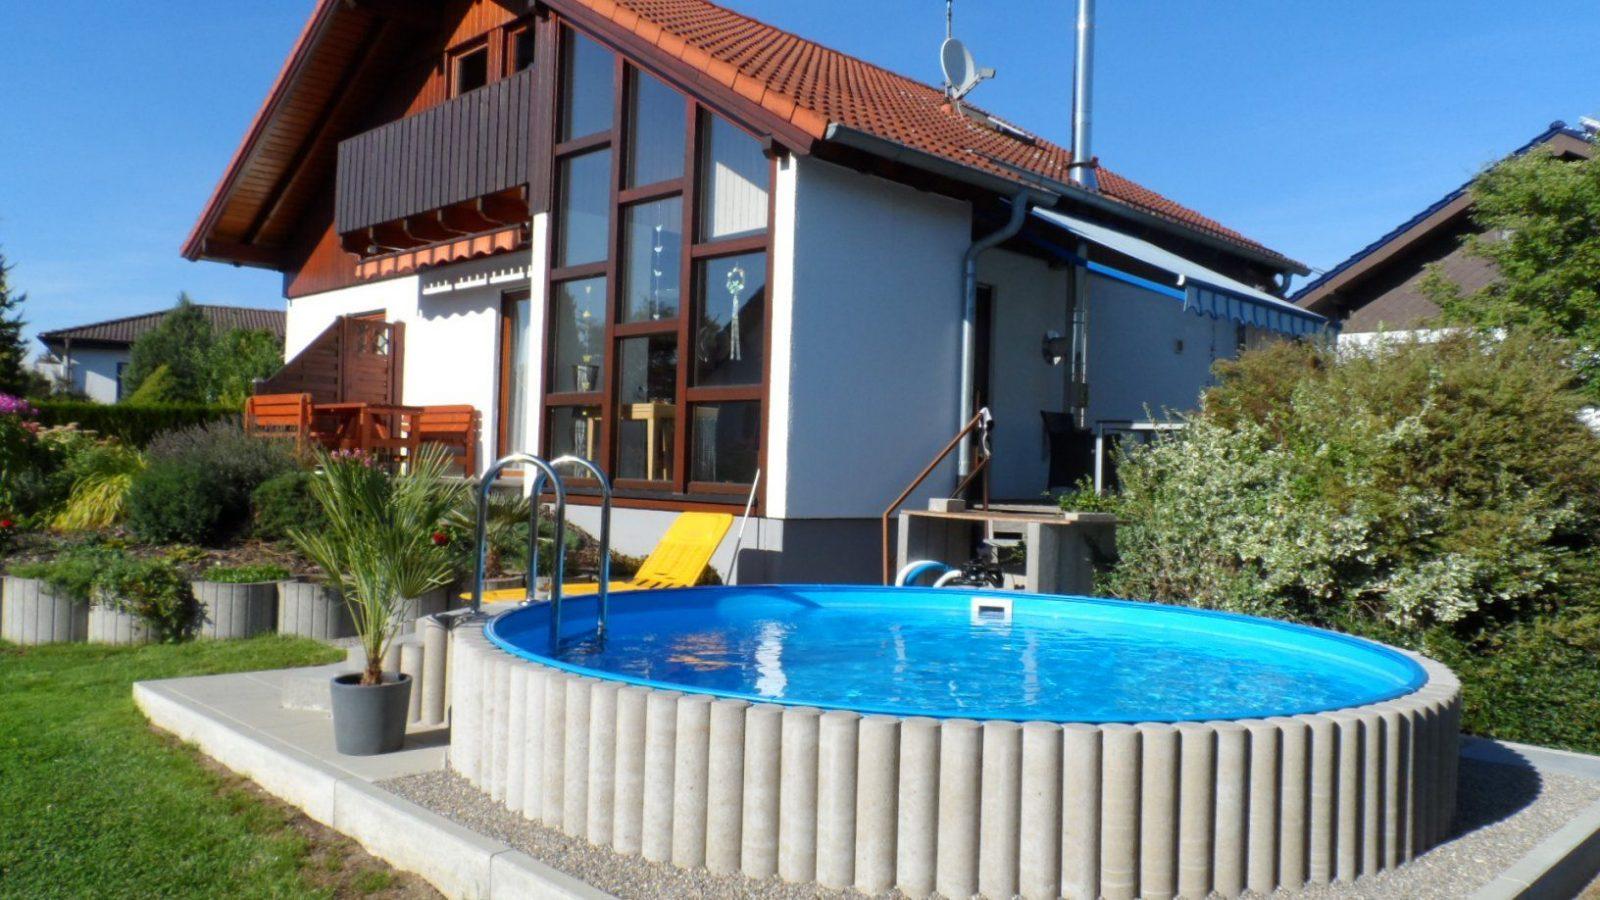 Infinity Pool Selber Bauen – Flashzoom In Genial Schwimmingpool von Pool Rutsche Selber Bauen Photo